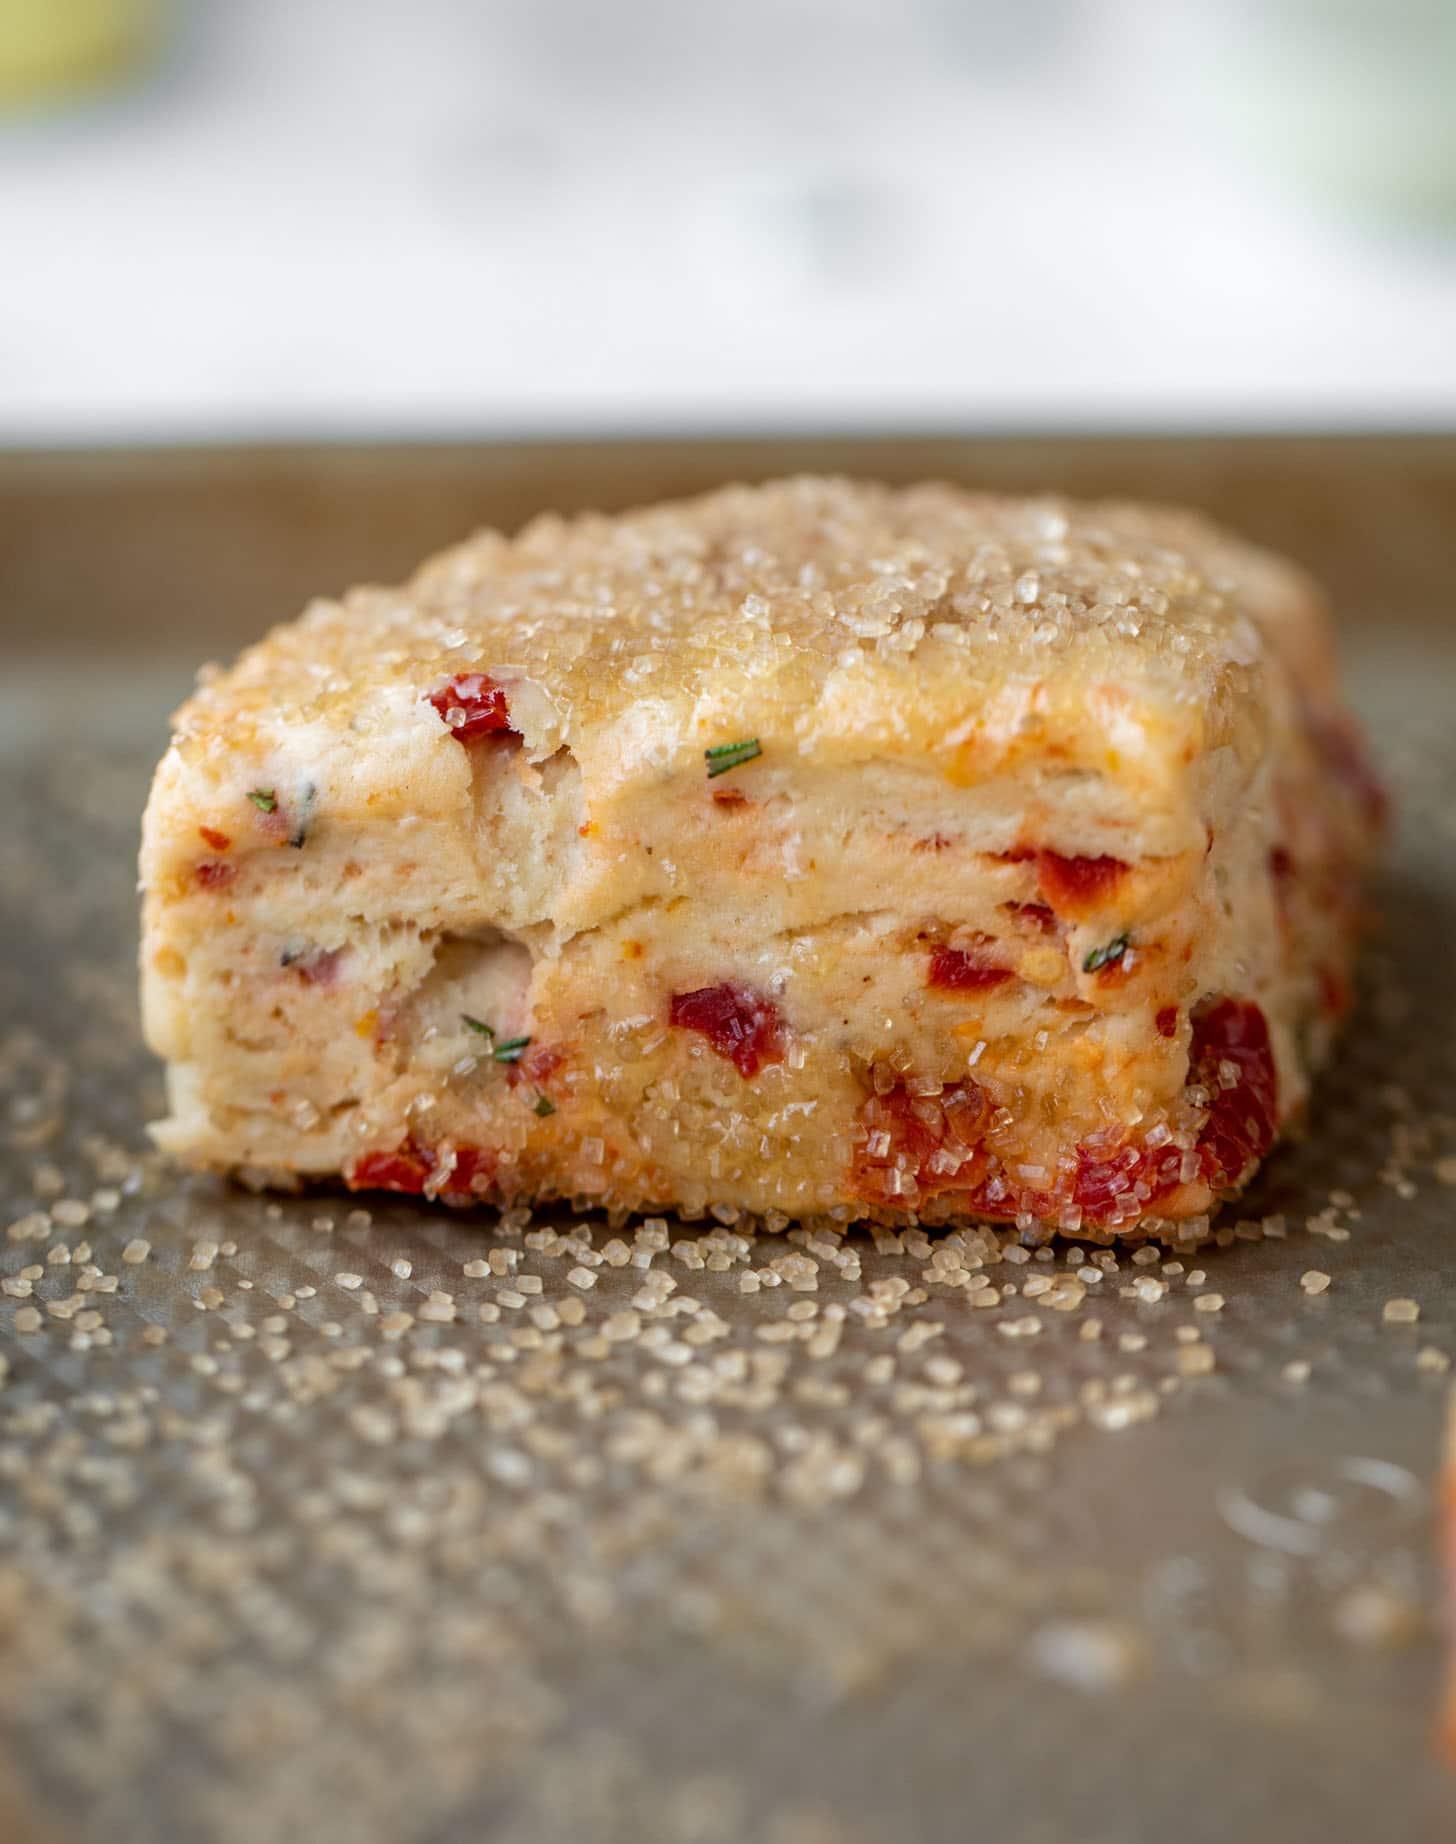 sun dried tomato scone ready for baking